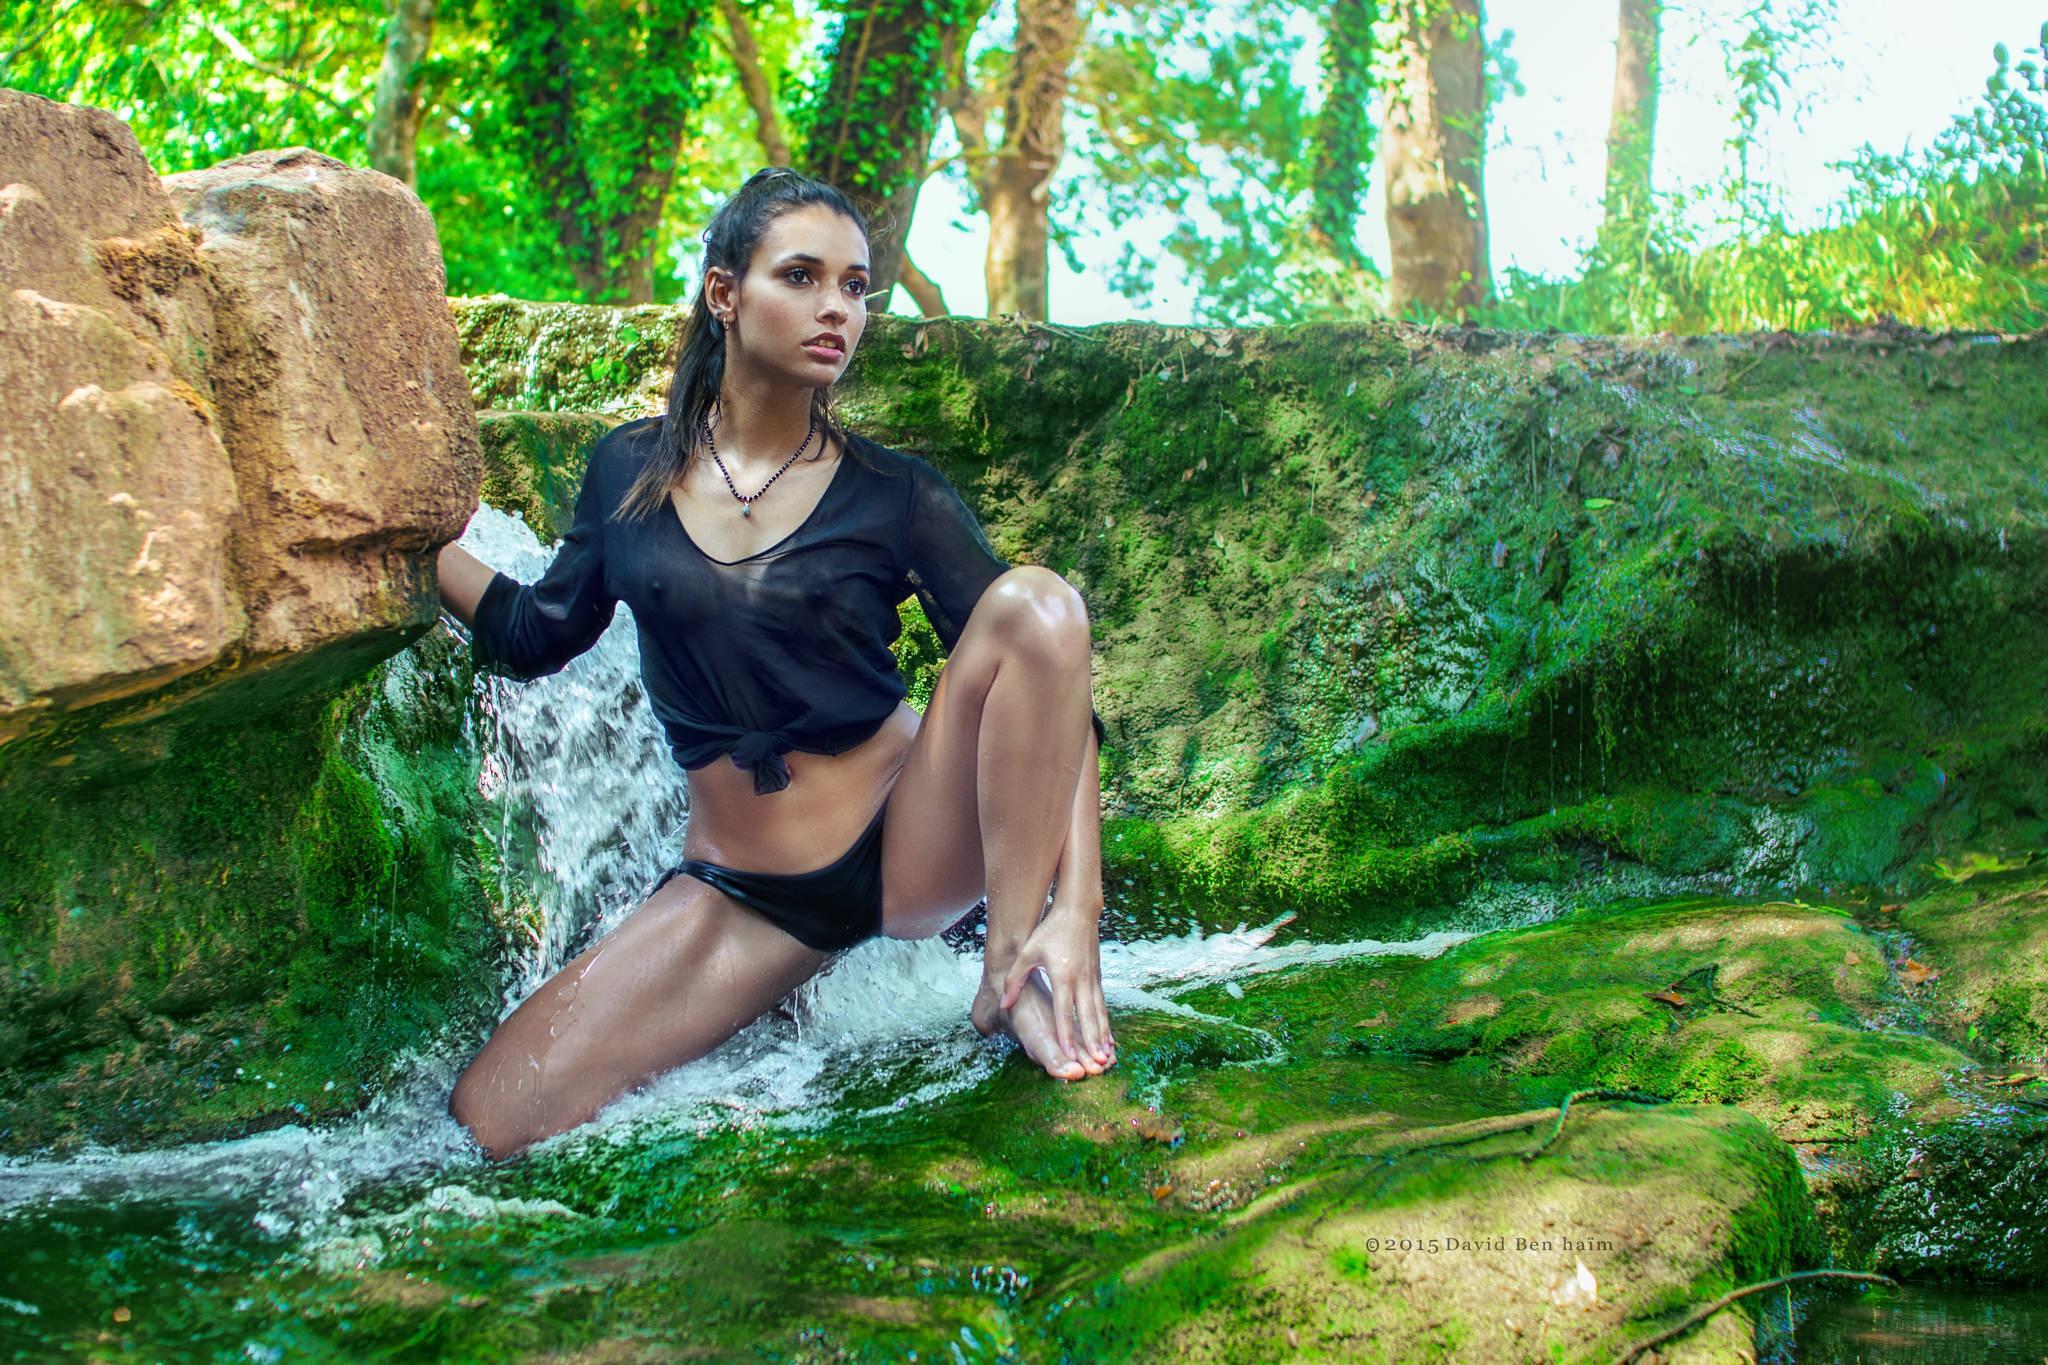 People 2048x1365 women model bikini see-through clothing nipples wet clothing wet body women outdoors nipples through clothing brunette